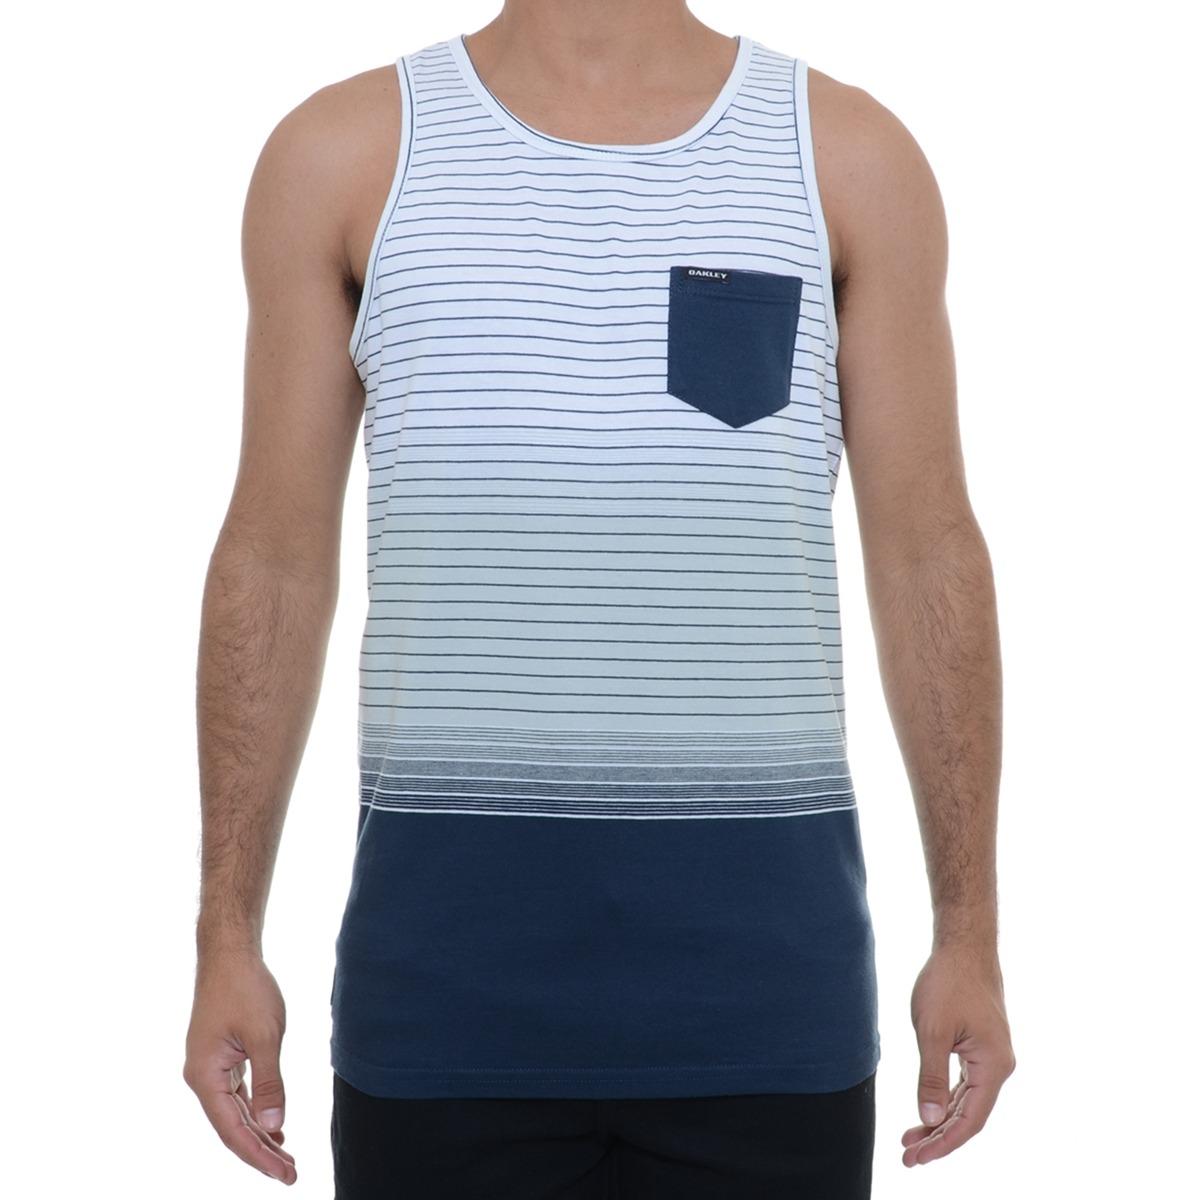 b9920692aec72 Camiseta Masculina Oakley Regata Fade Tank Branca - R  74,00 em ...